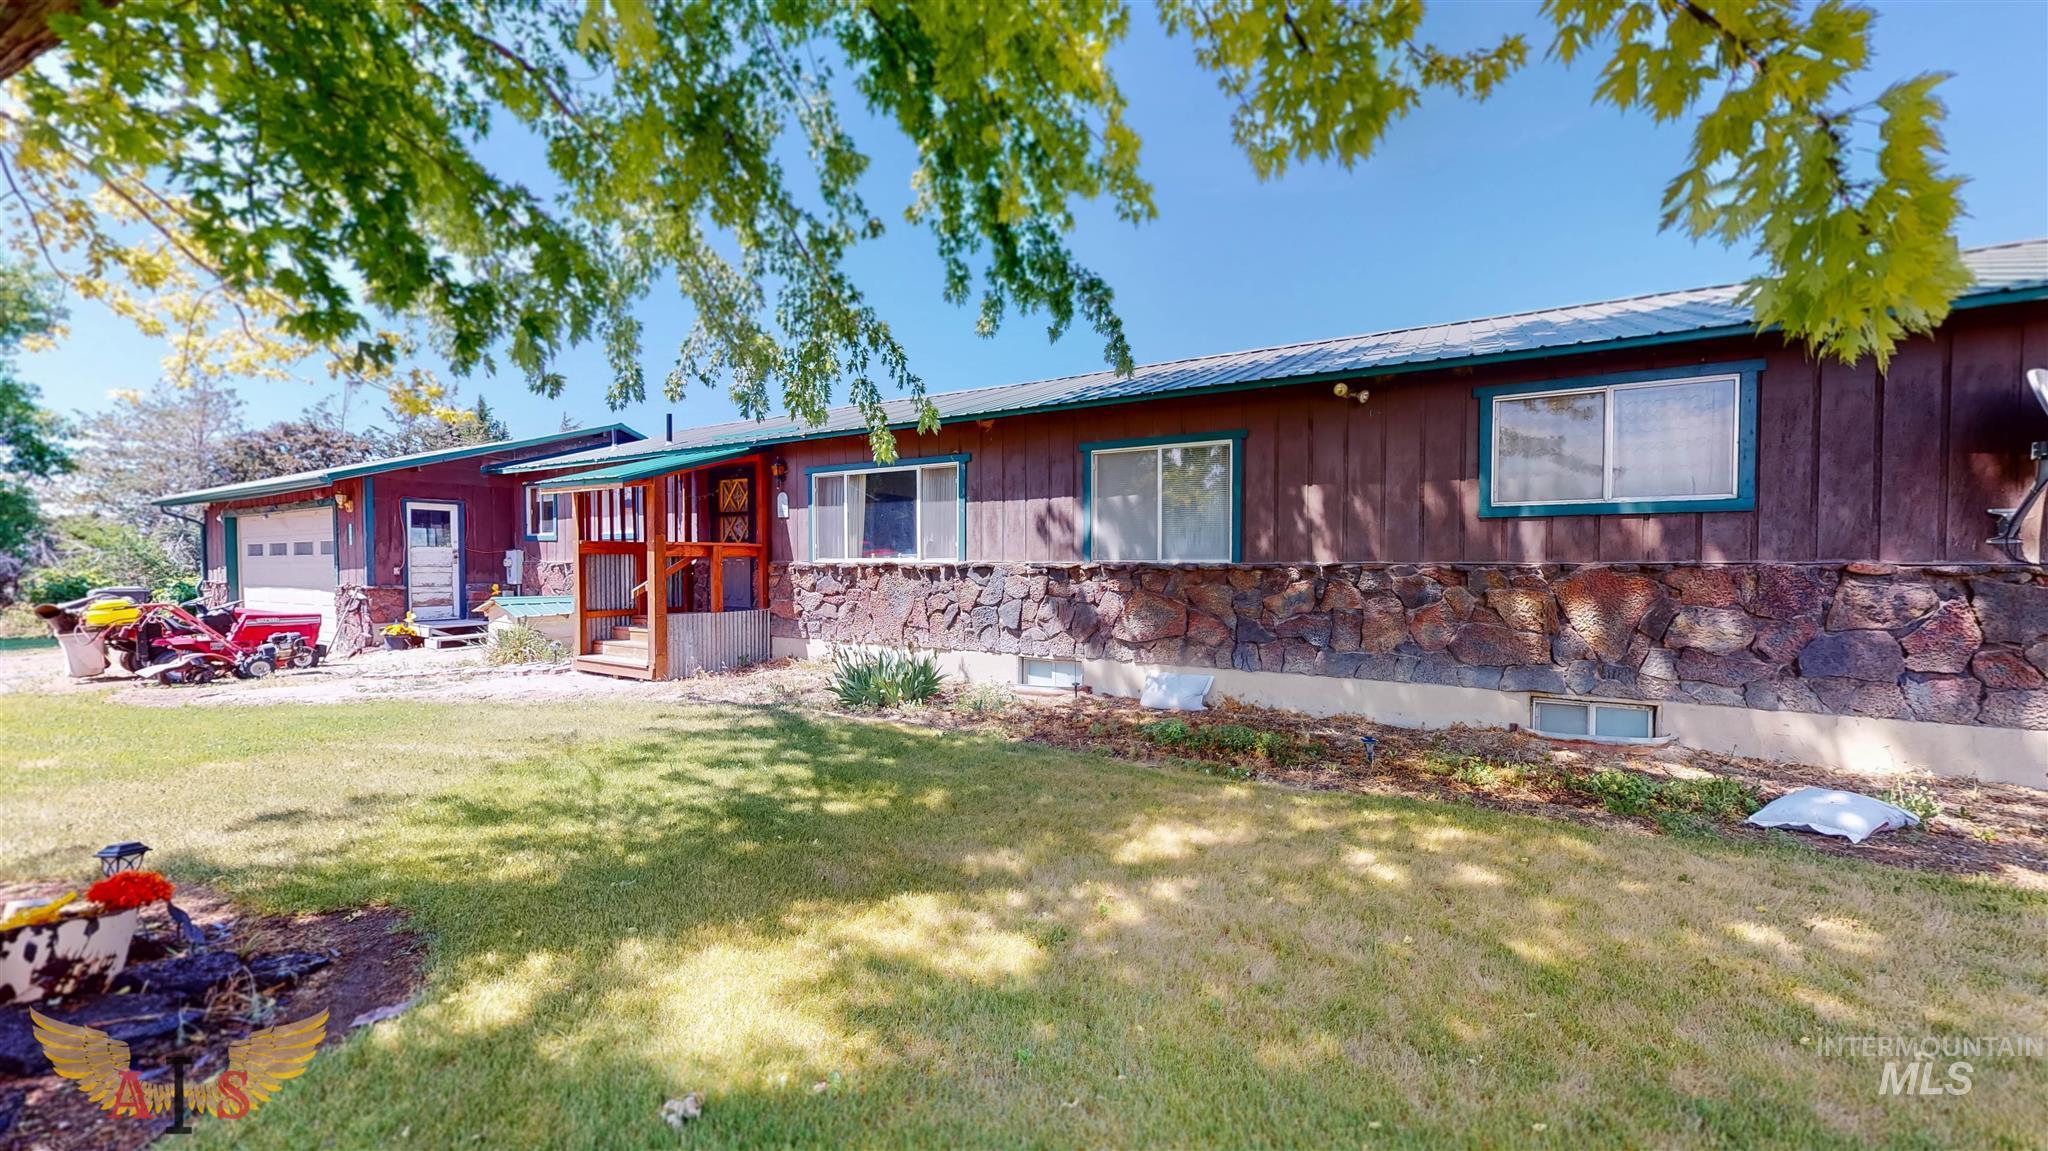 4360 N 0900 E Property Photo 1